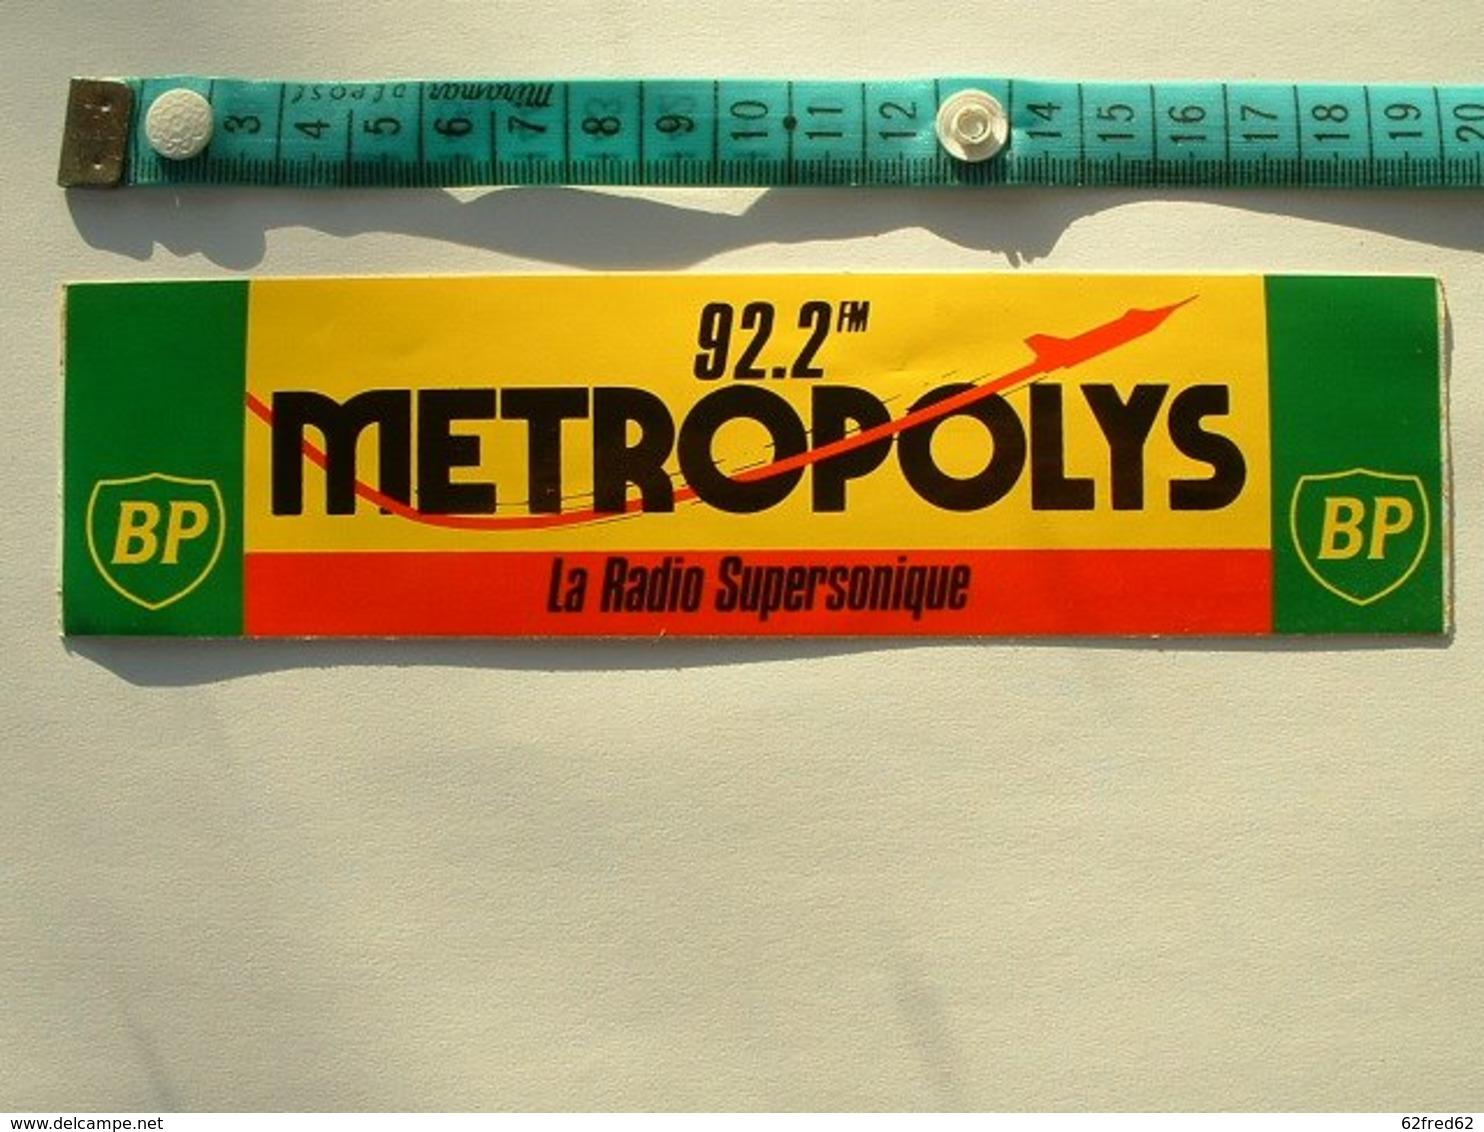 AUTOCOLLANT RADIO METROPOLYS - BP - Aufkleber